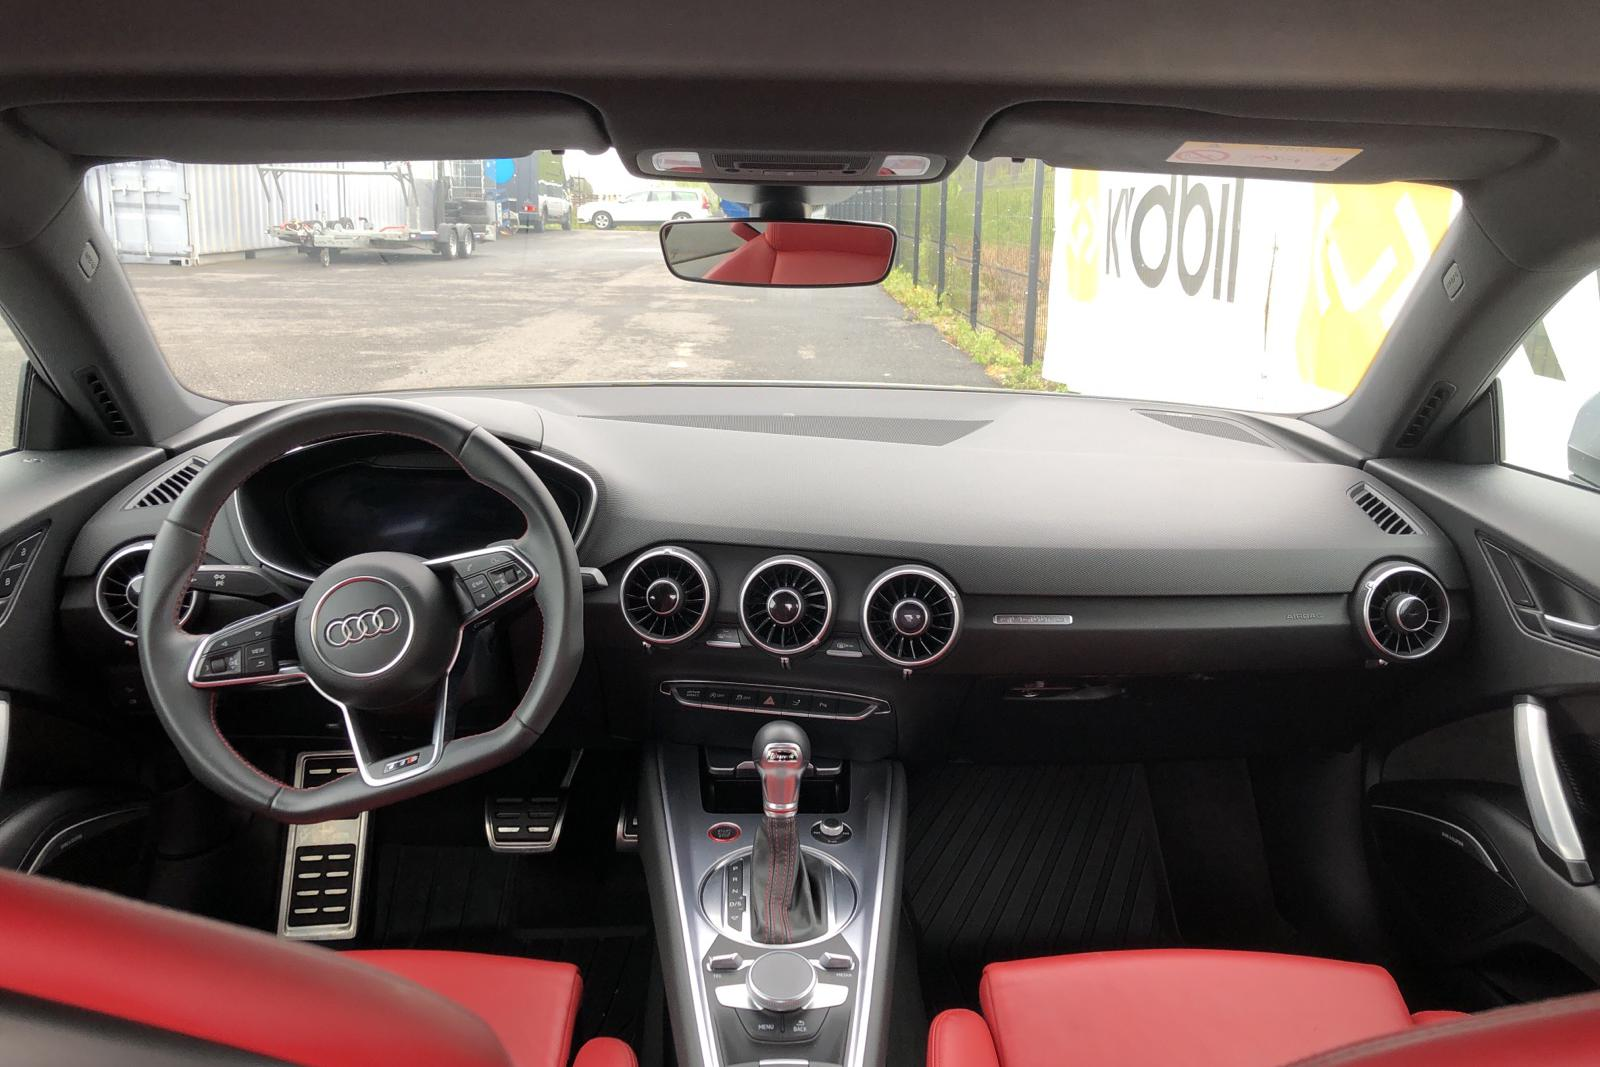 Audi TT S 2.0 TFSI Coupé quattro (310hk) - 5 720 mil - Automat - vit - 2018